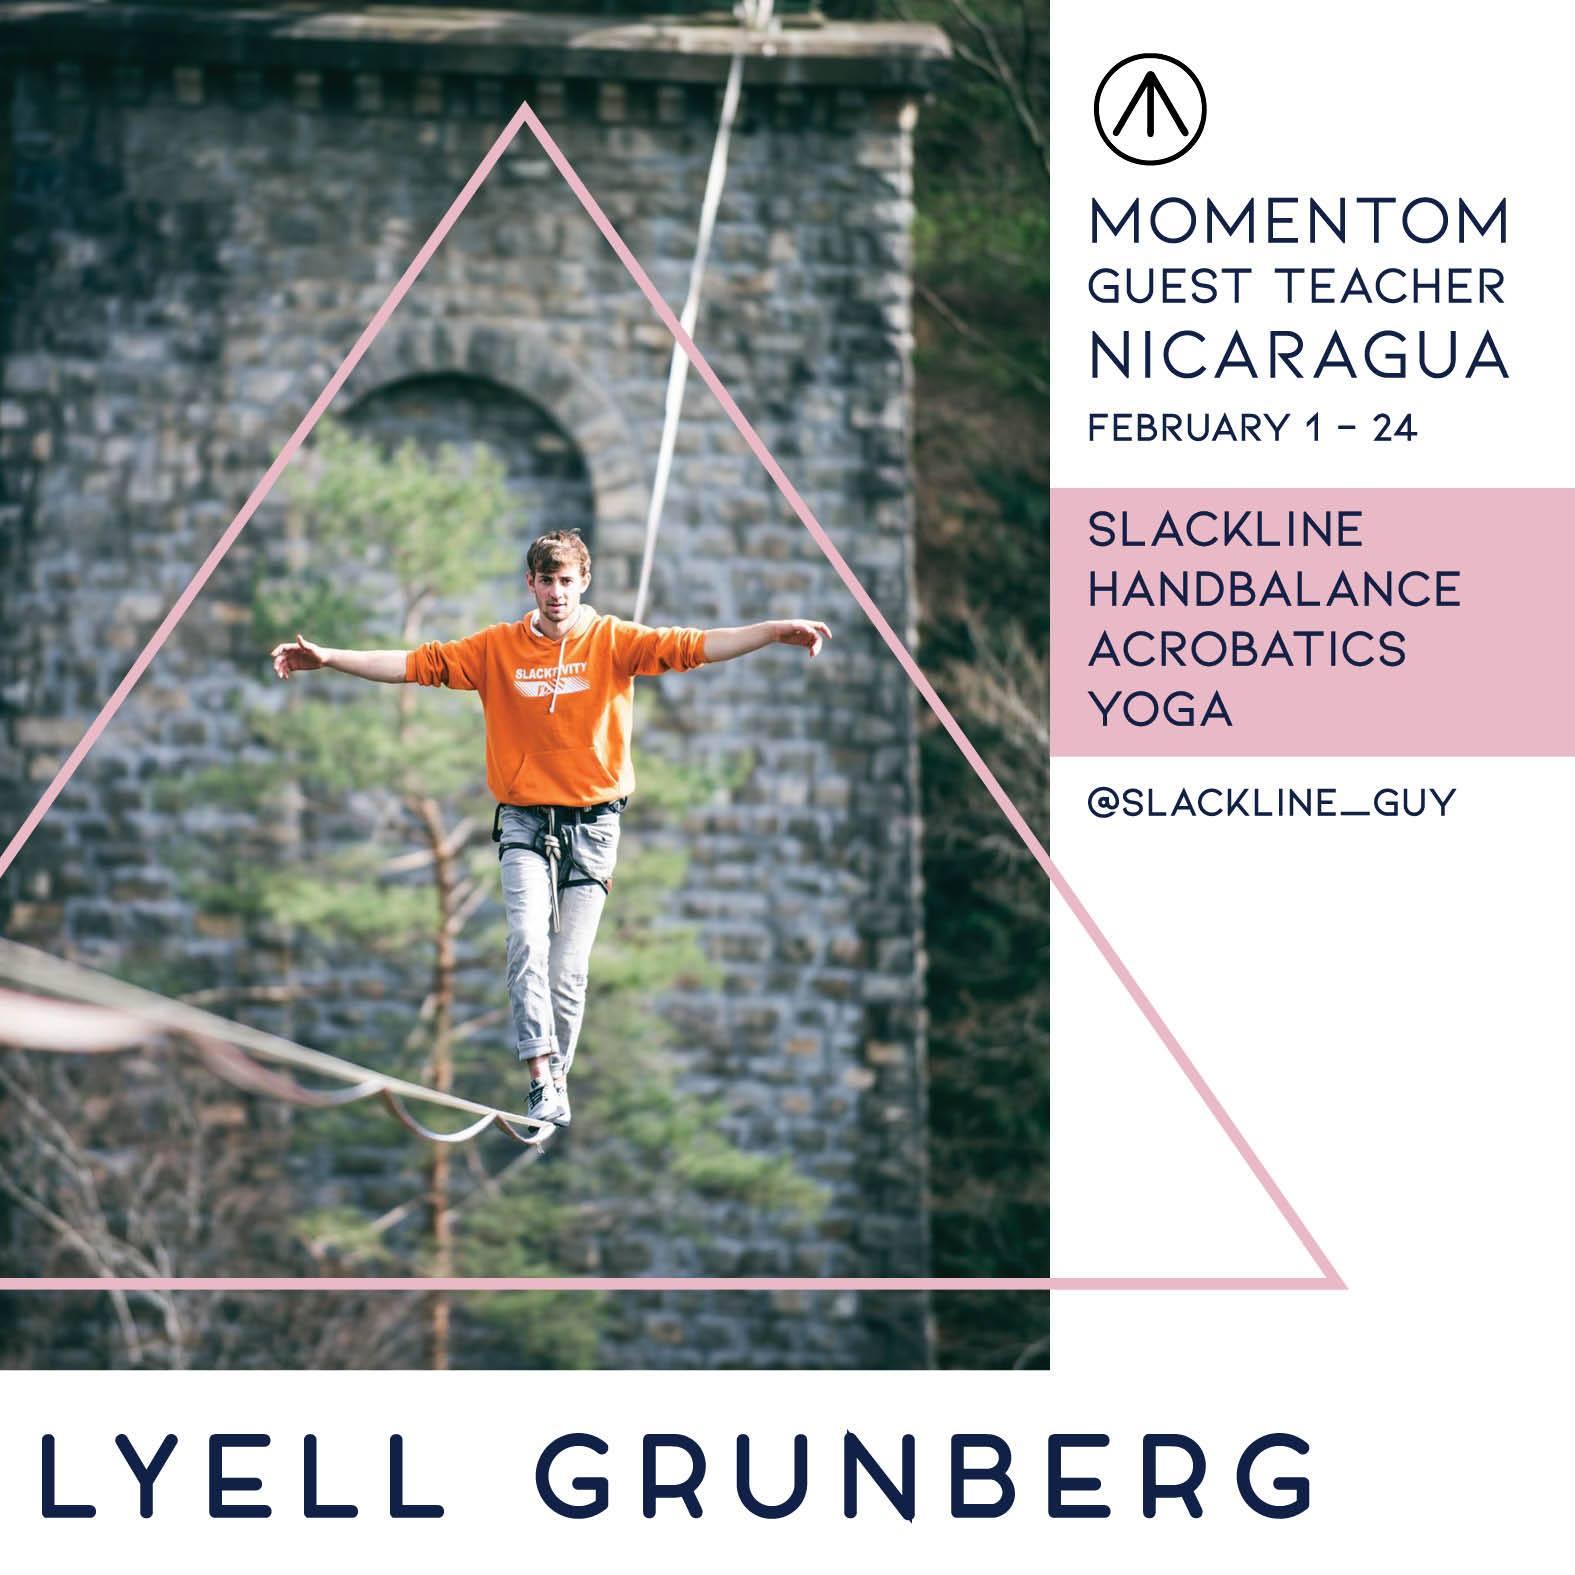 momentom collective teacher Nicaragua highline trickline show funambule circus performance spectacle ecole suisse Slackline Lyell Grunberg .jpg